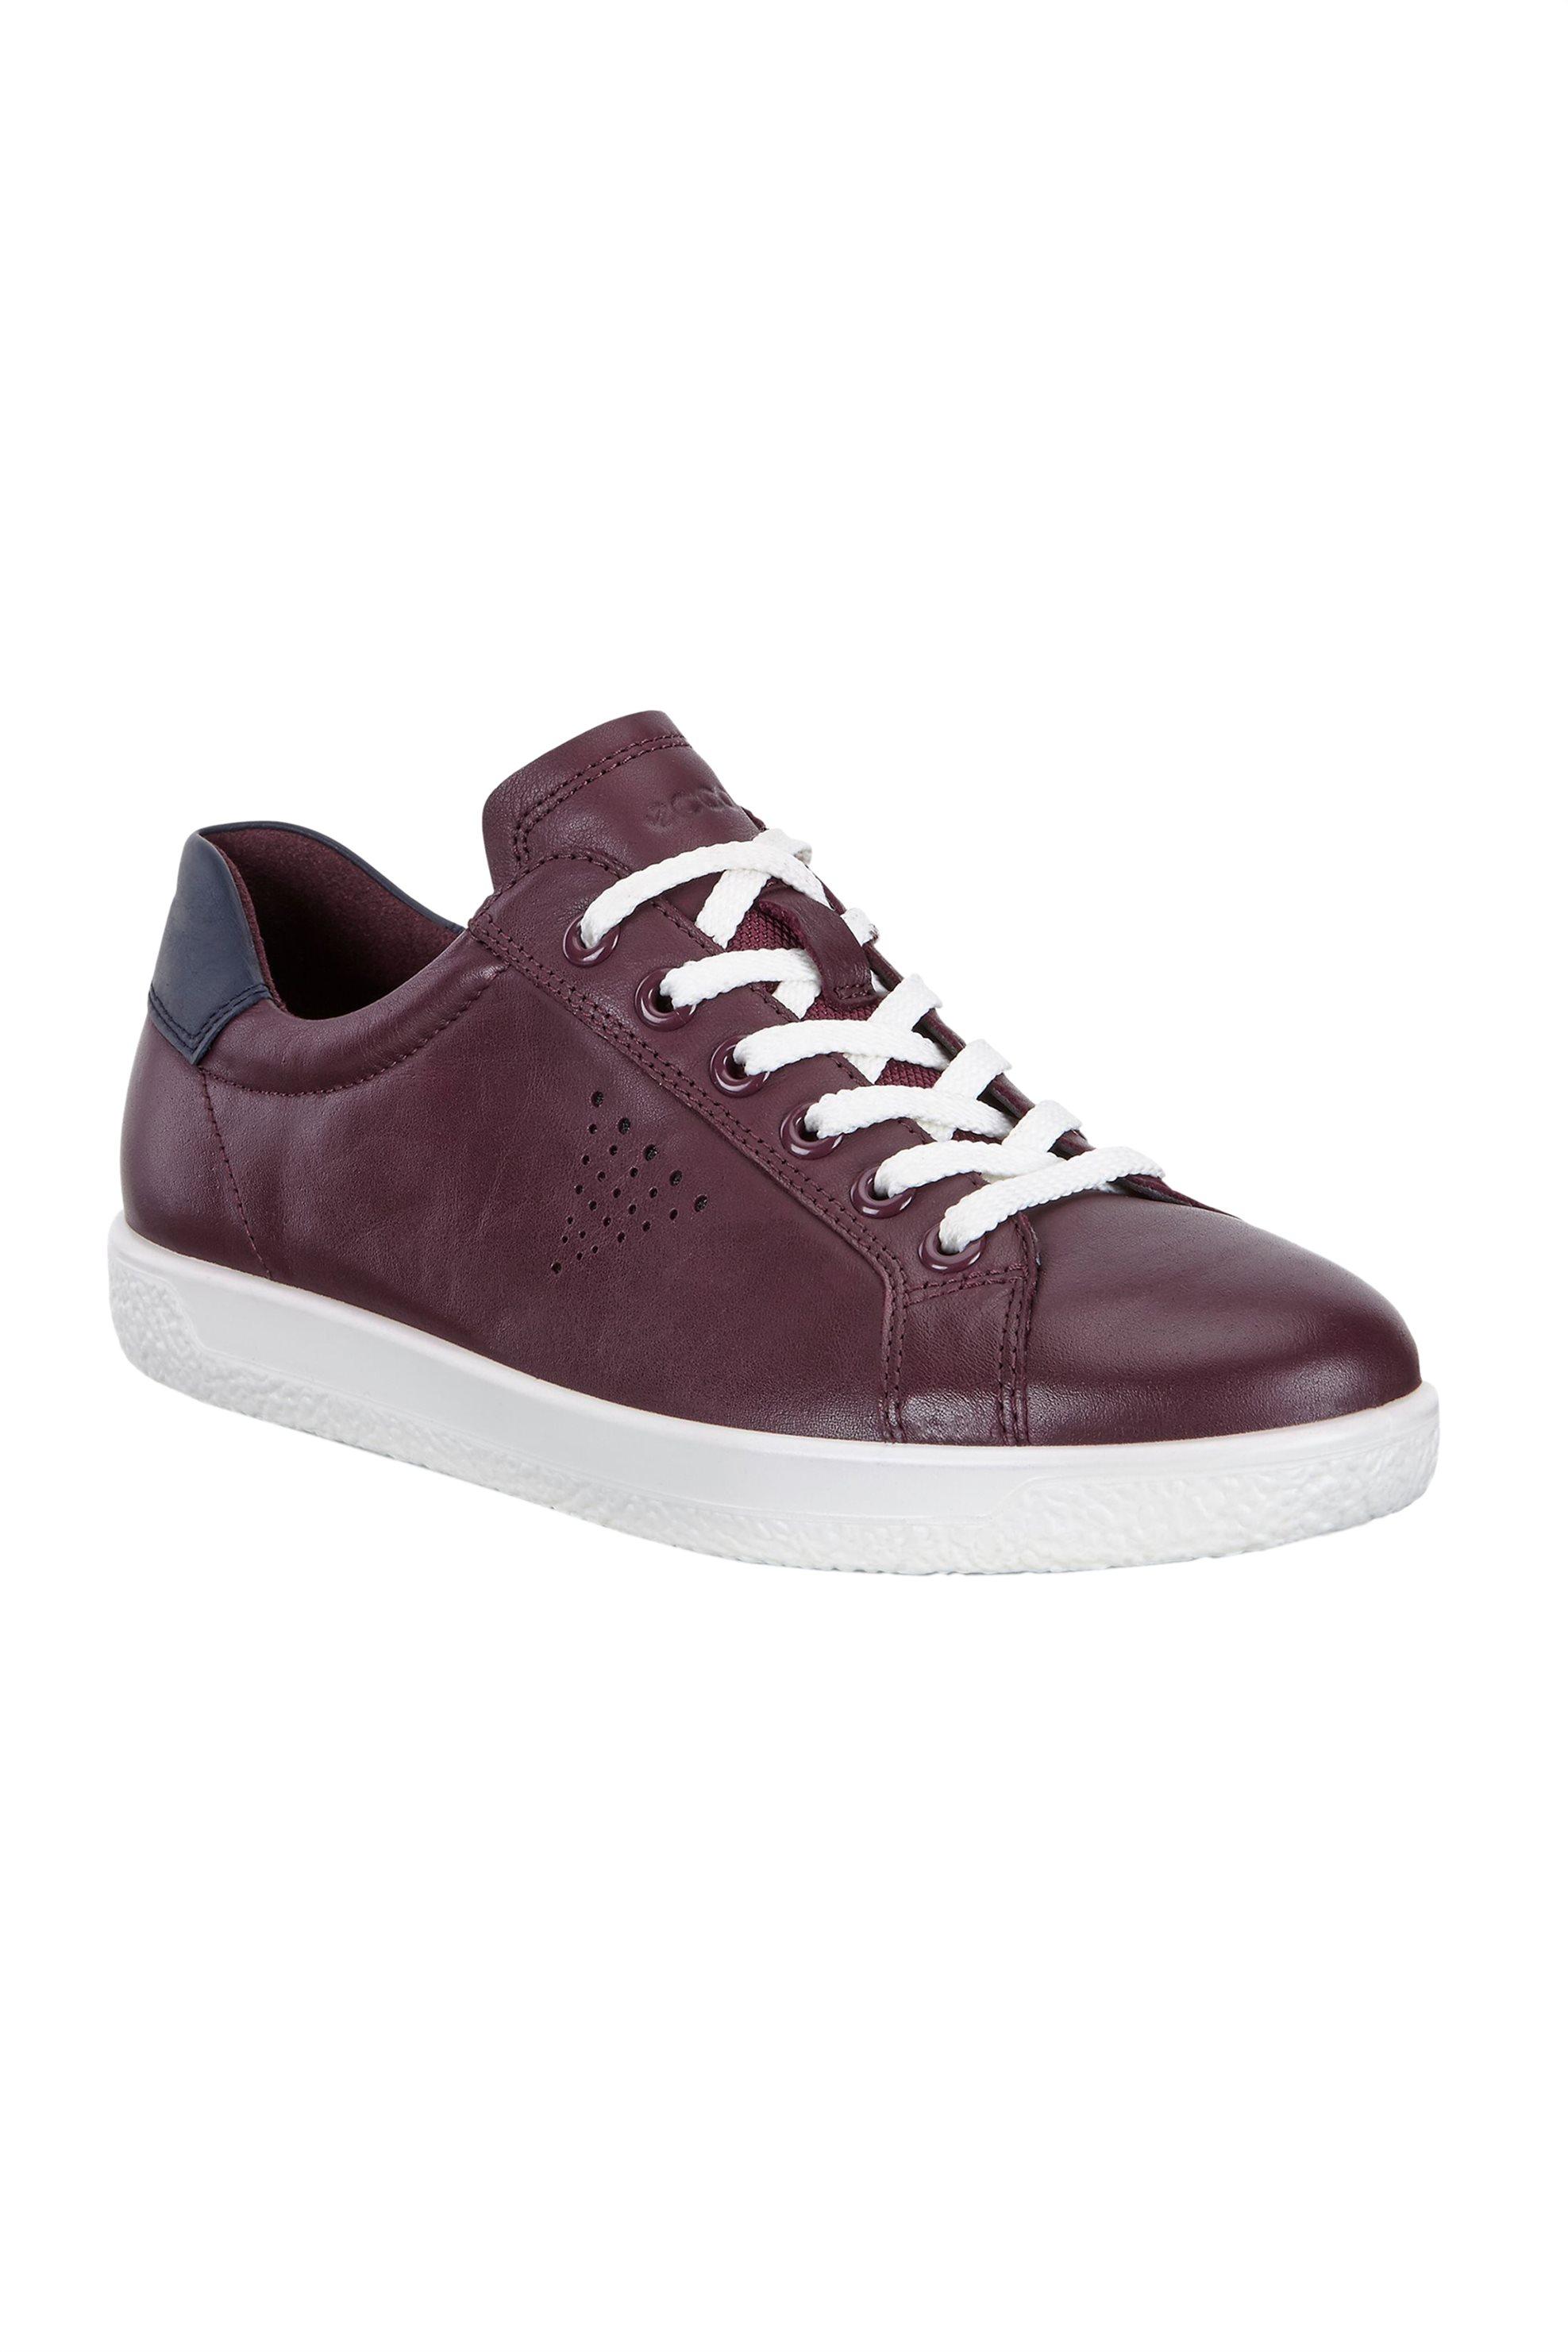 Notos ECCO γυναικεία παπούτσια με κορδόνια Soft 1 – 400583 – Μπορντό b2911113899